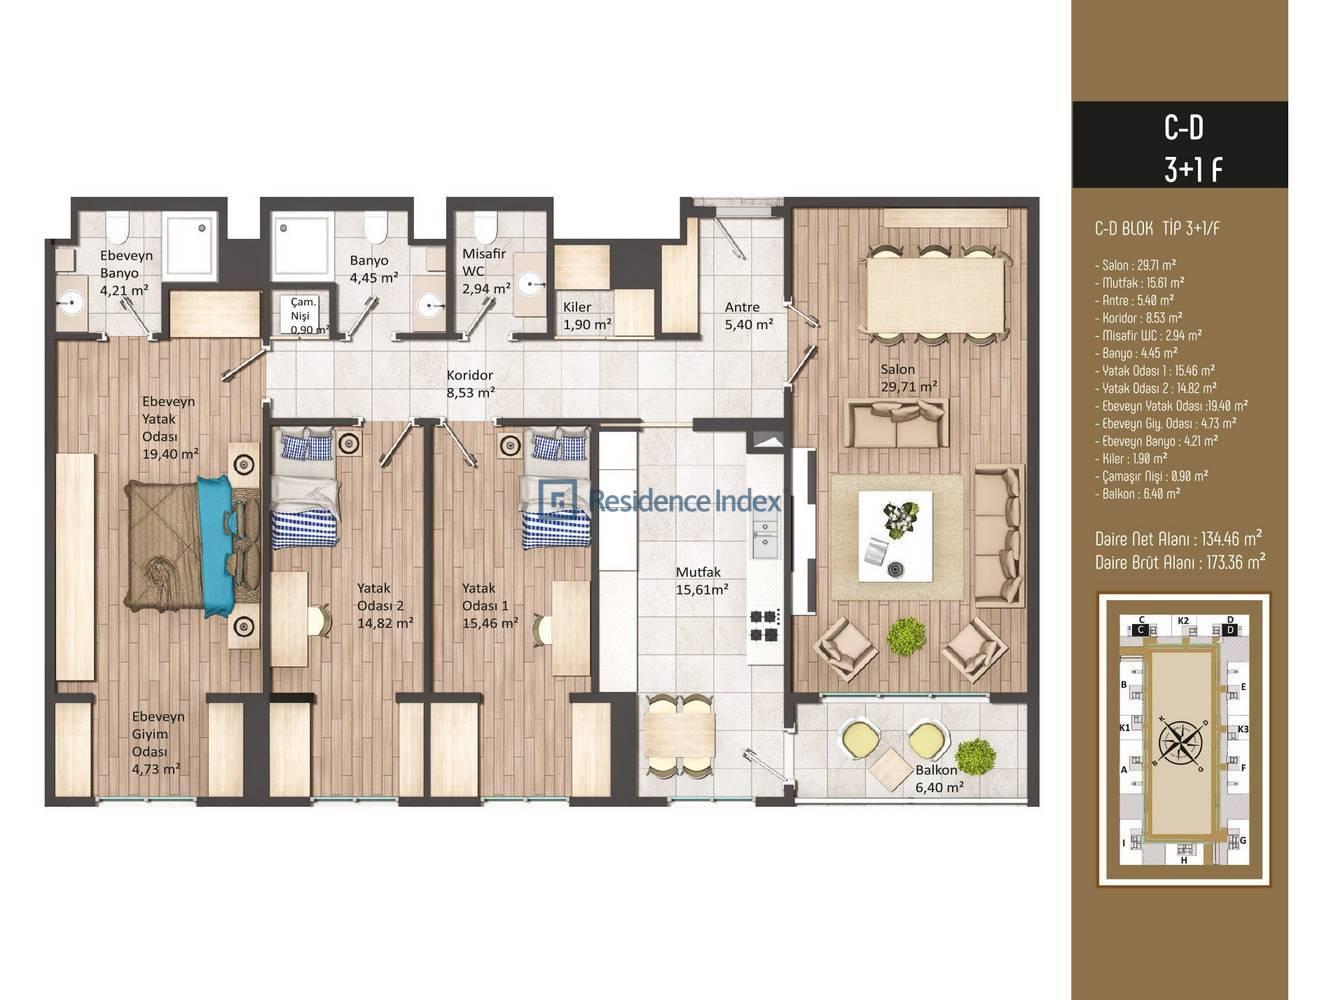 Kameroğlu Metrohome Residence 3+1 F